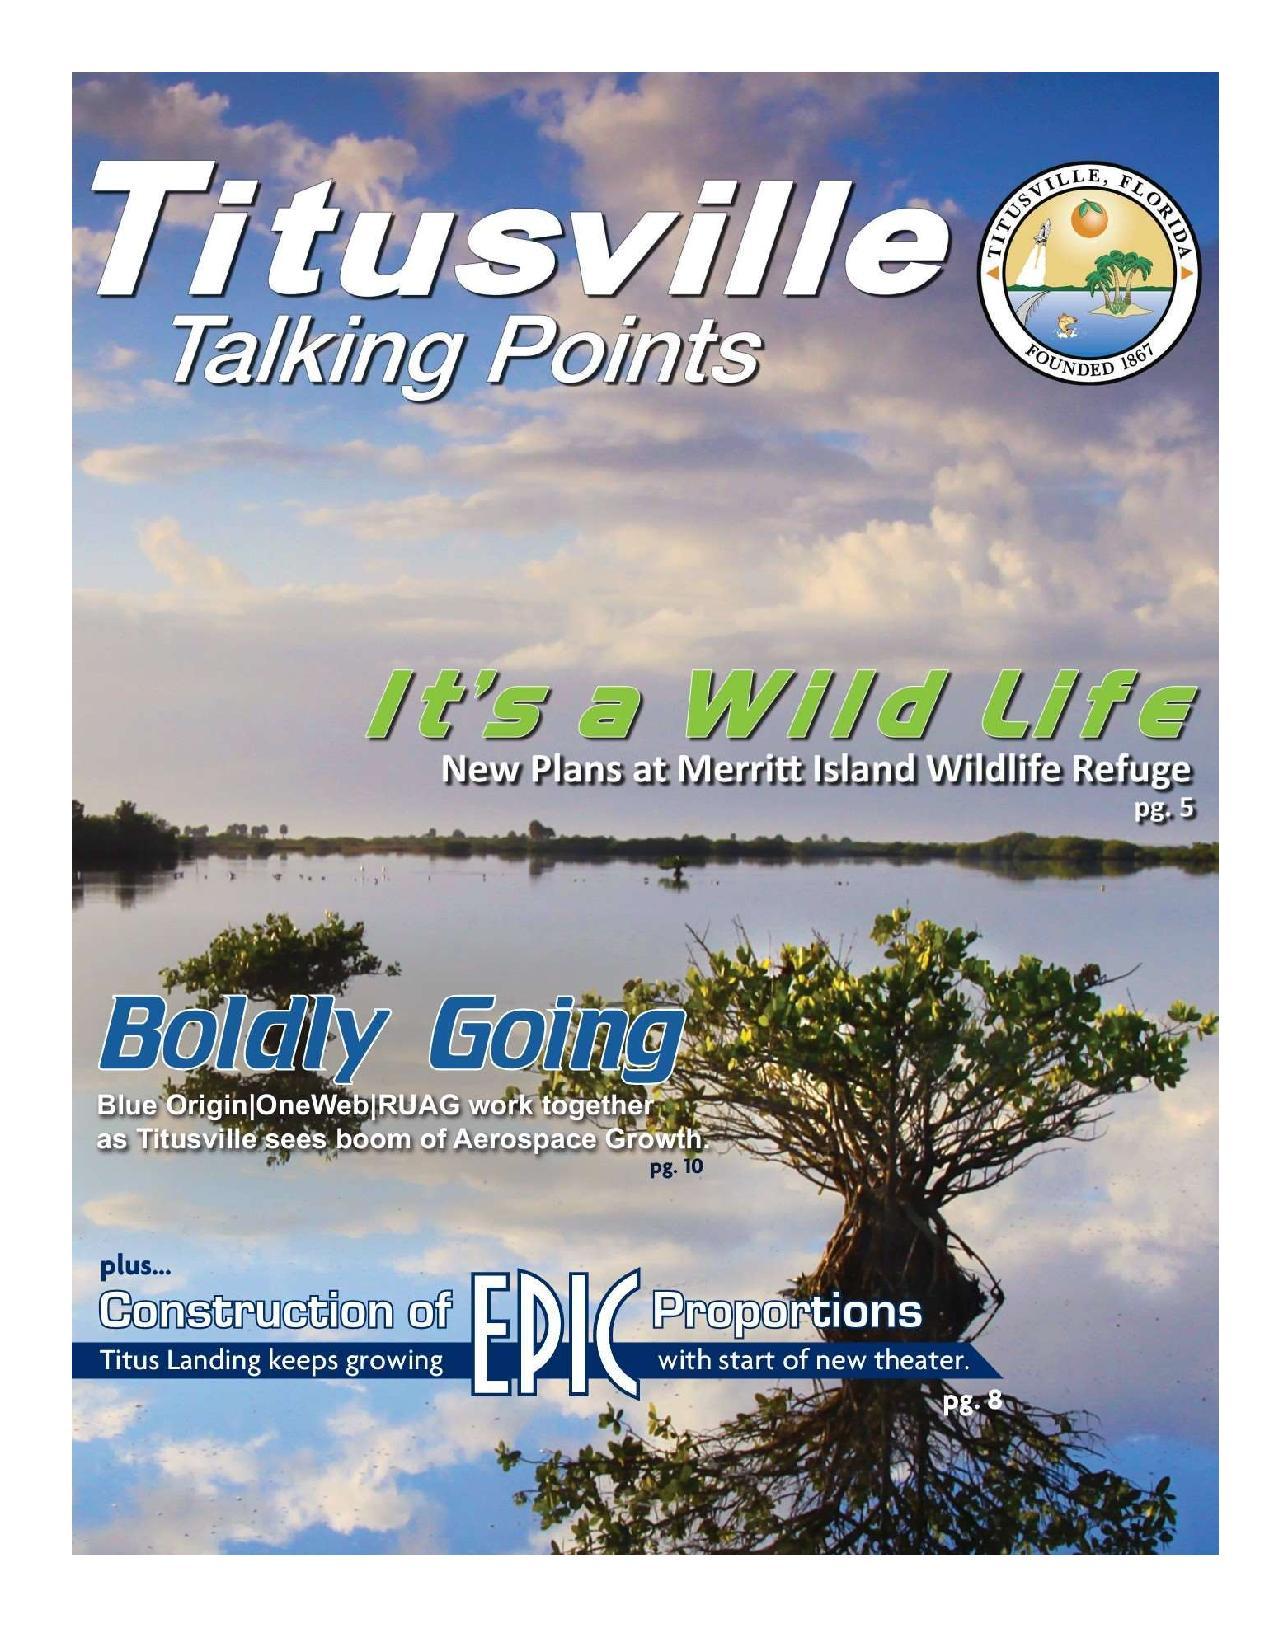 2017 Update on Titusville Happenings